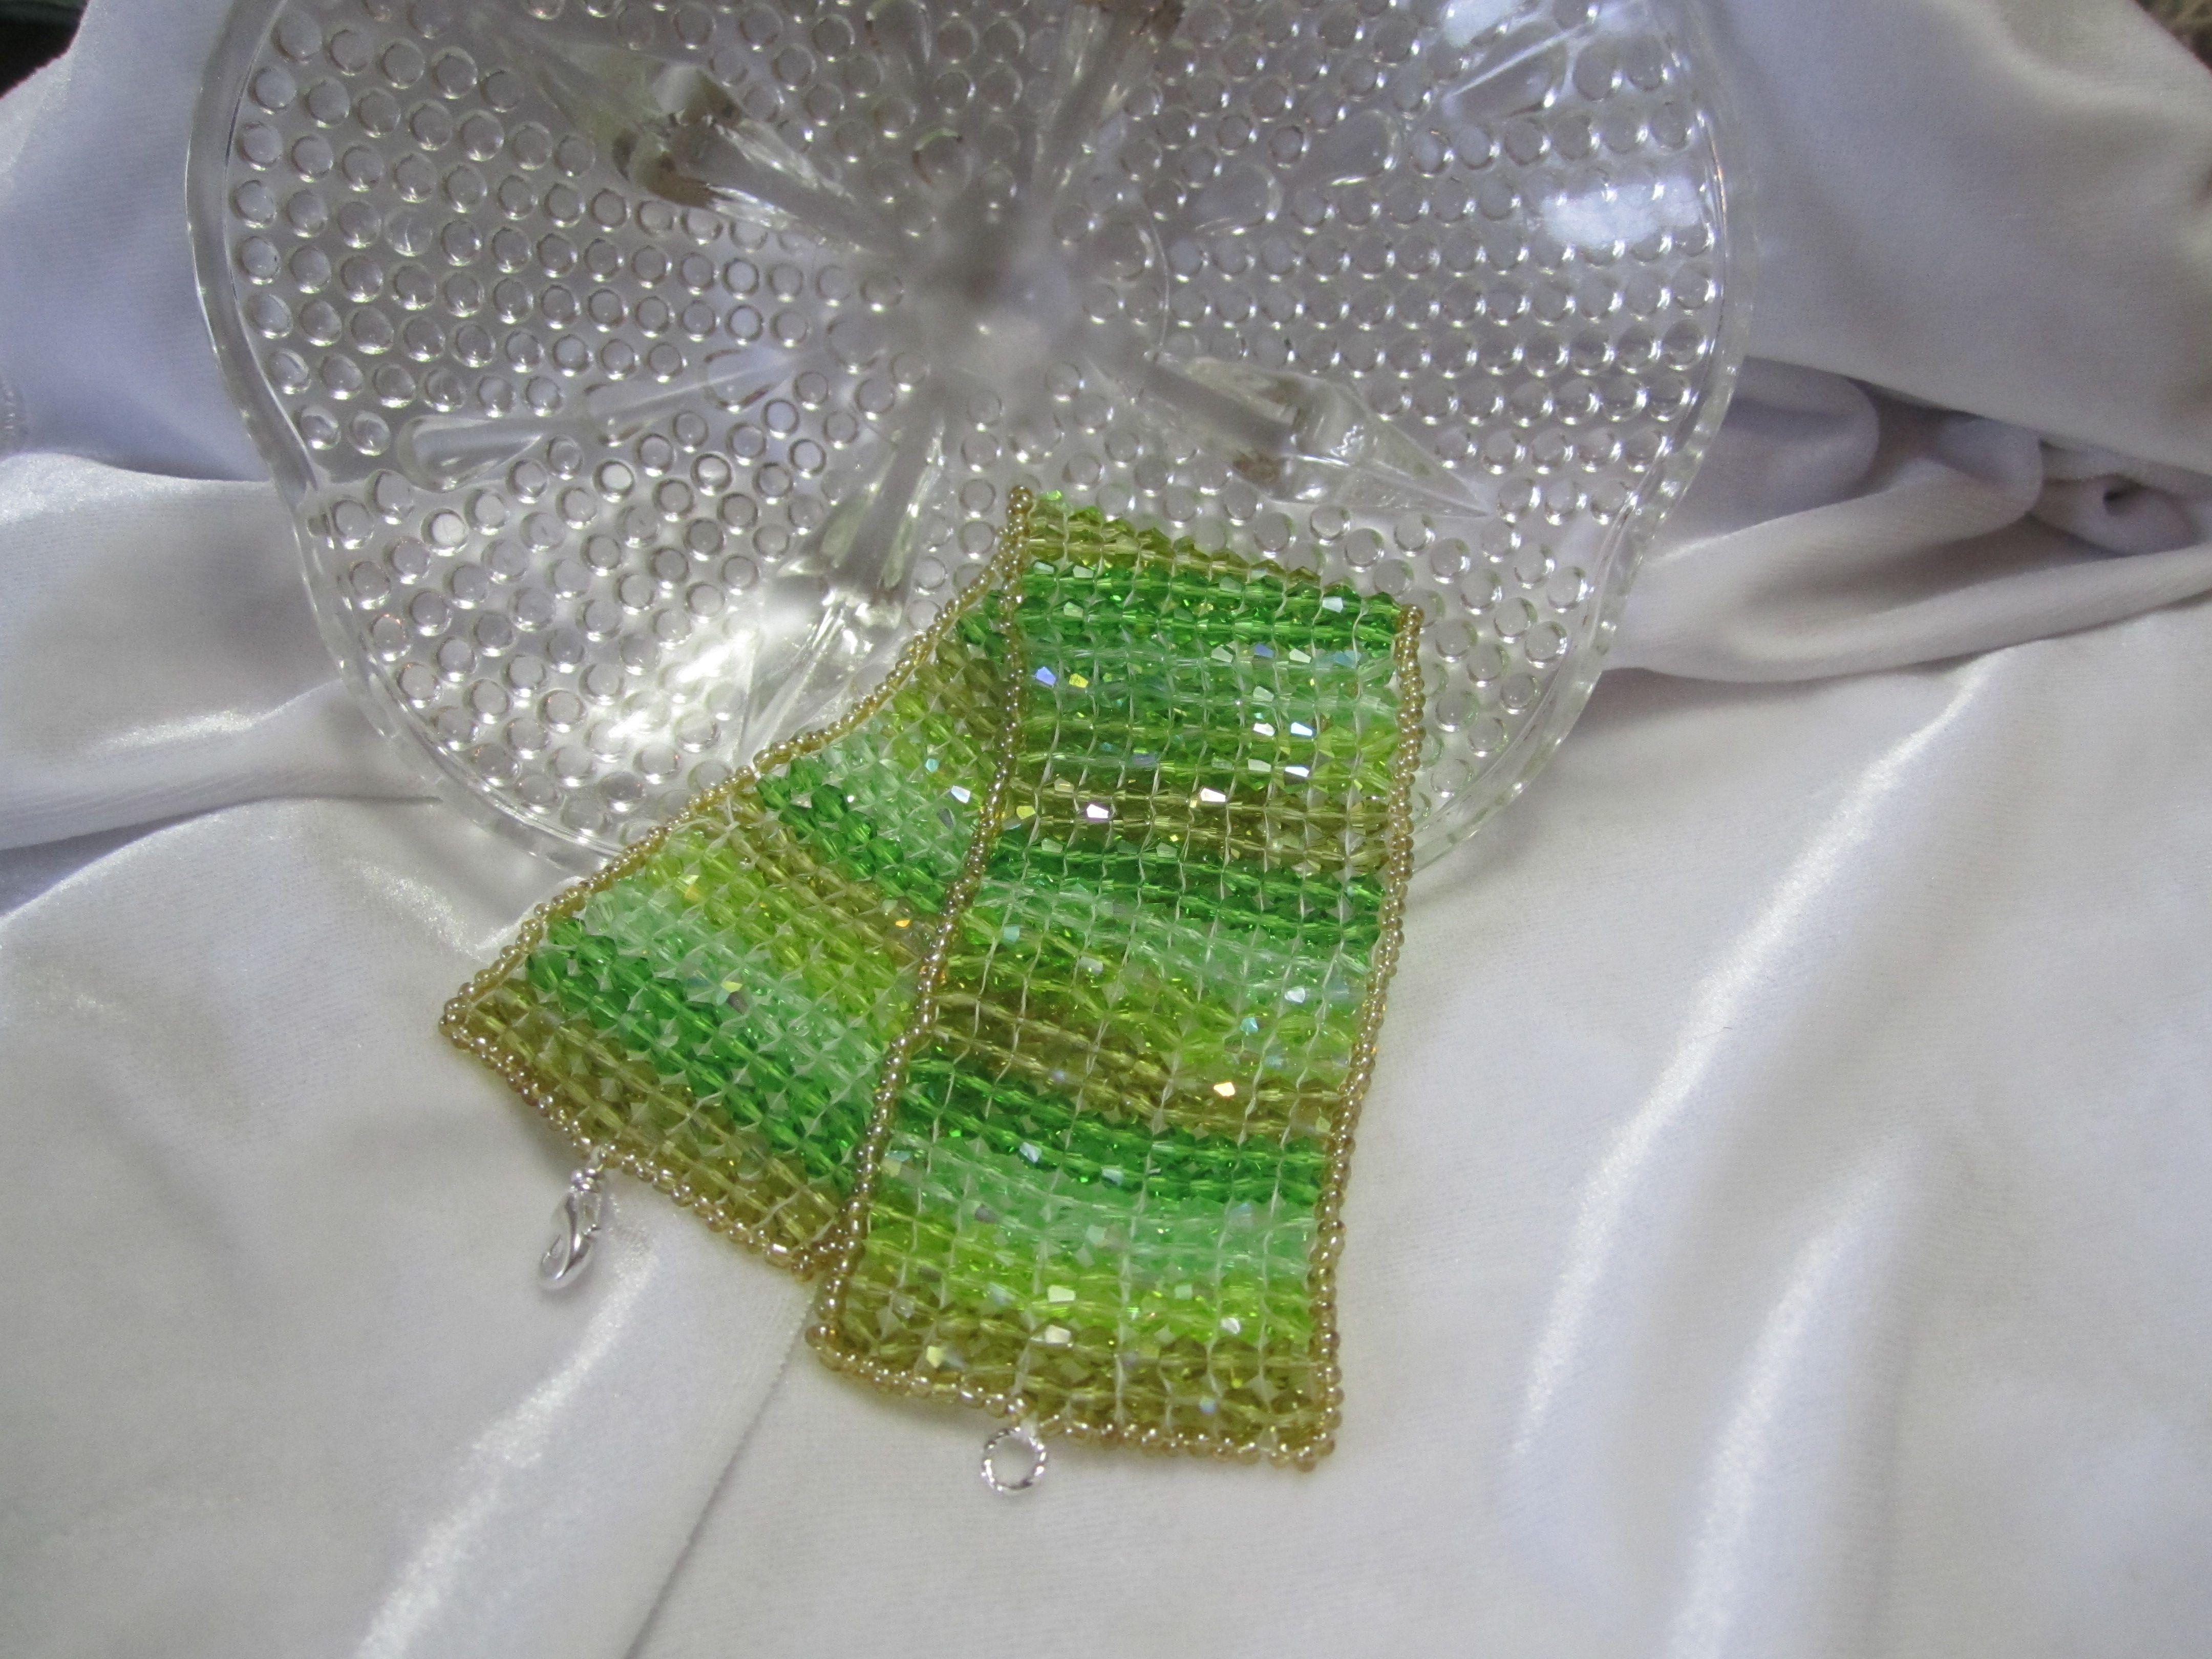 Swarovski AB2X Bicone Crystal Bracelet, shades of green, 1 1/2 inches wide, size 8.5.